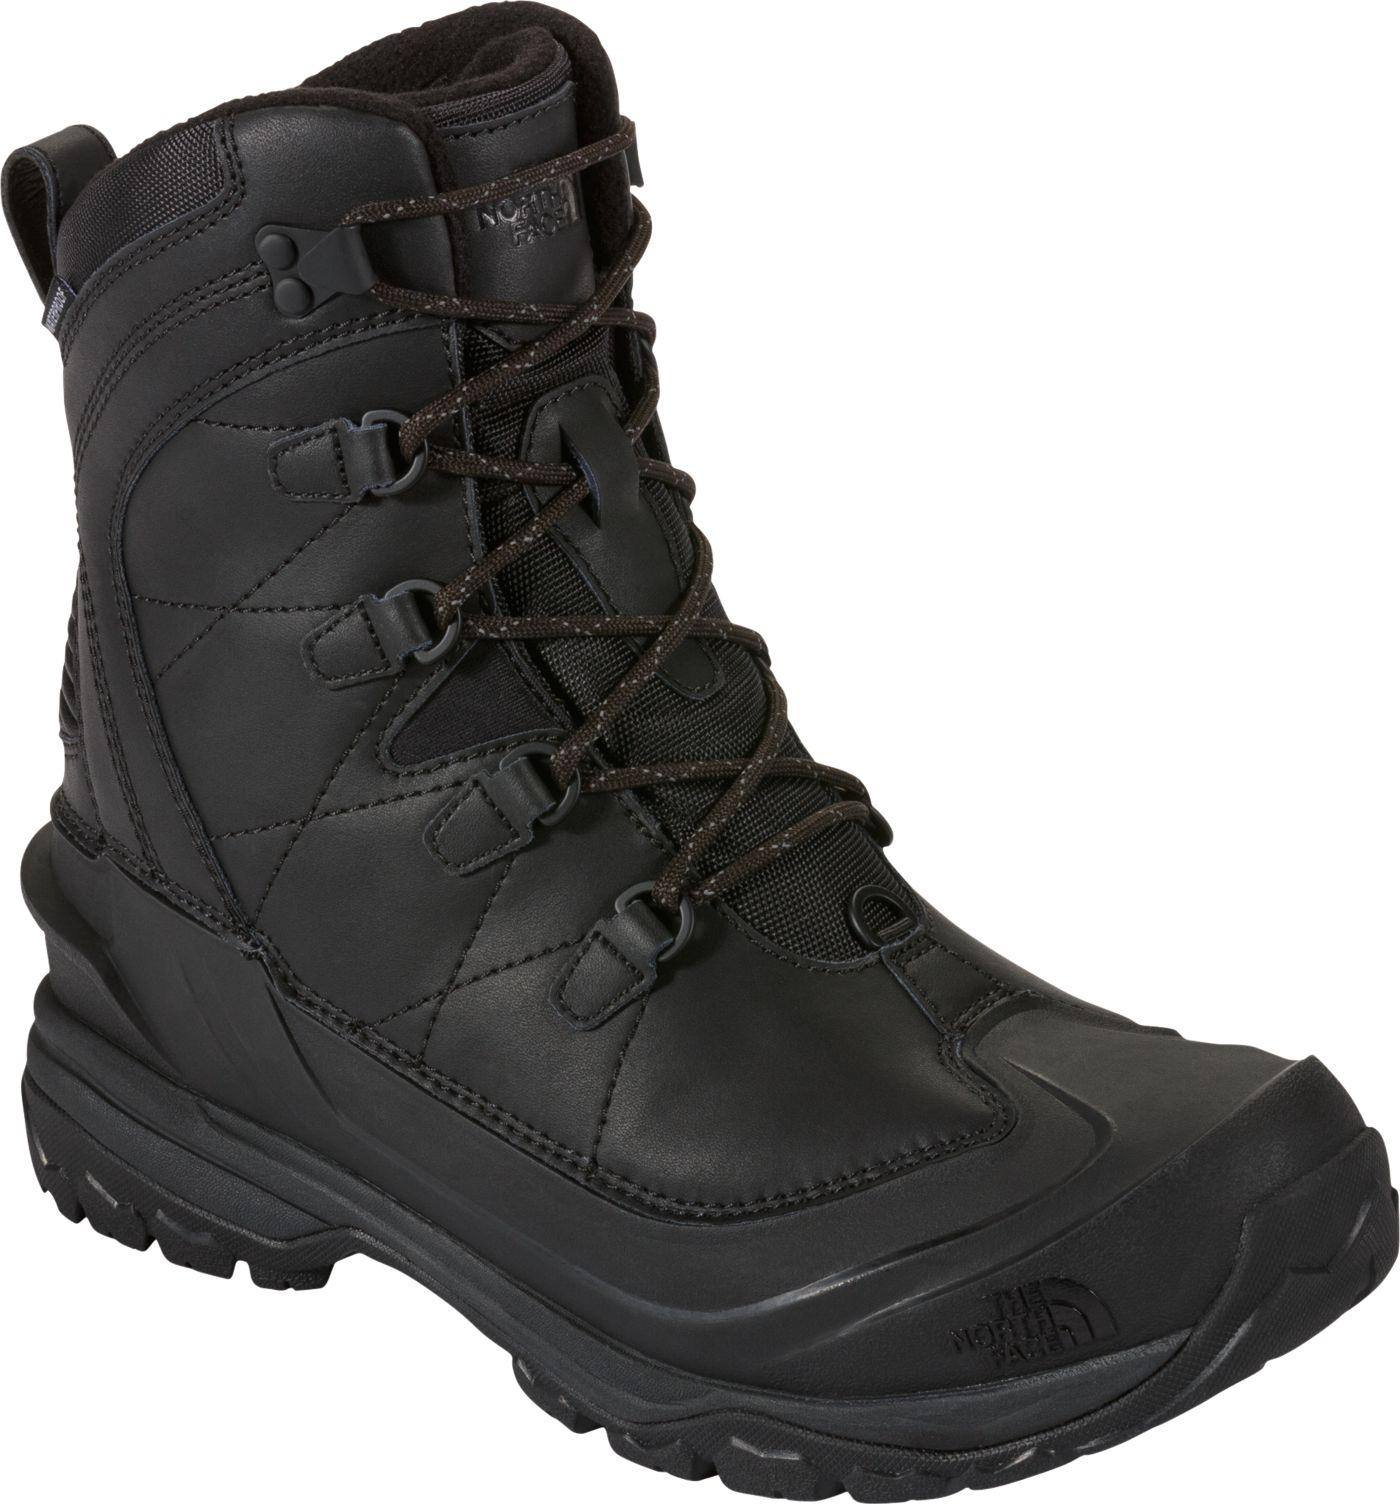 The North Face Men's Chilkat Evo 200g Waterproof Winter Boots - Past Season